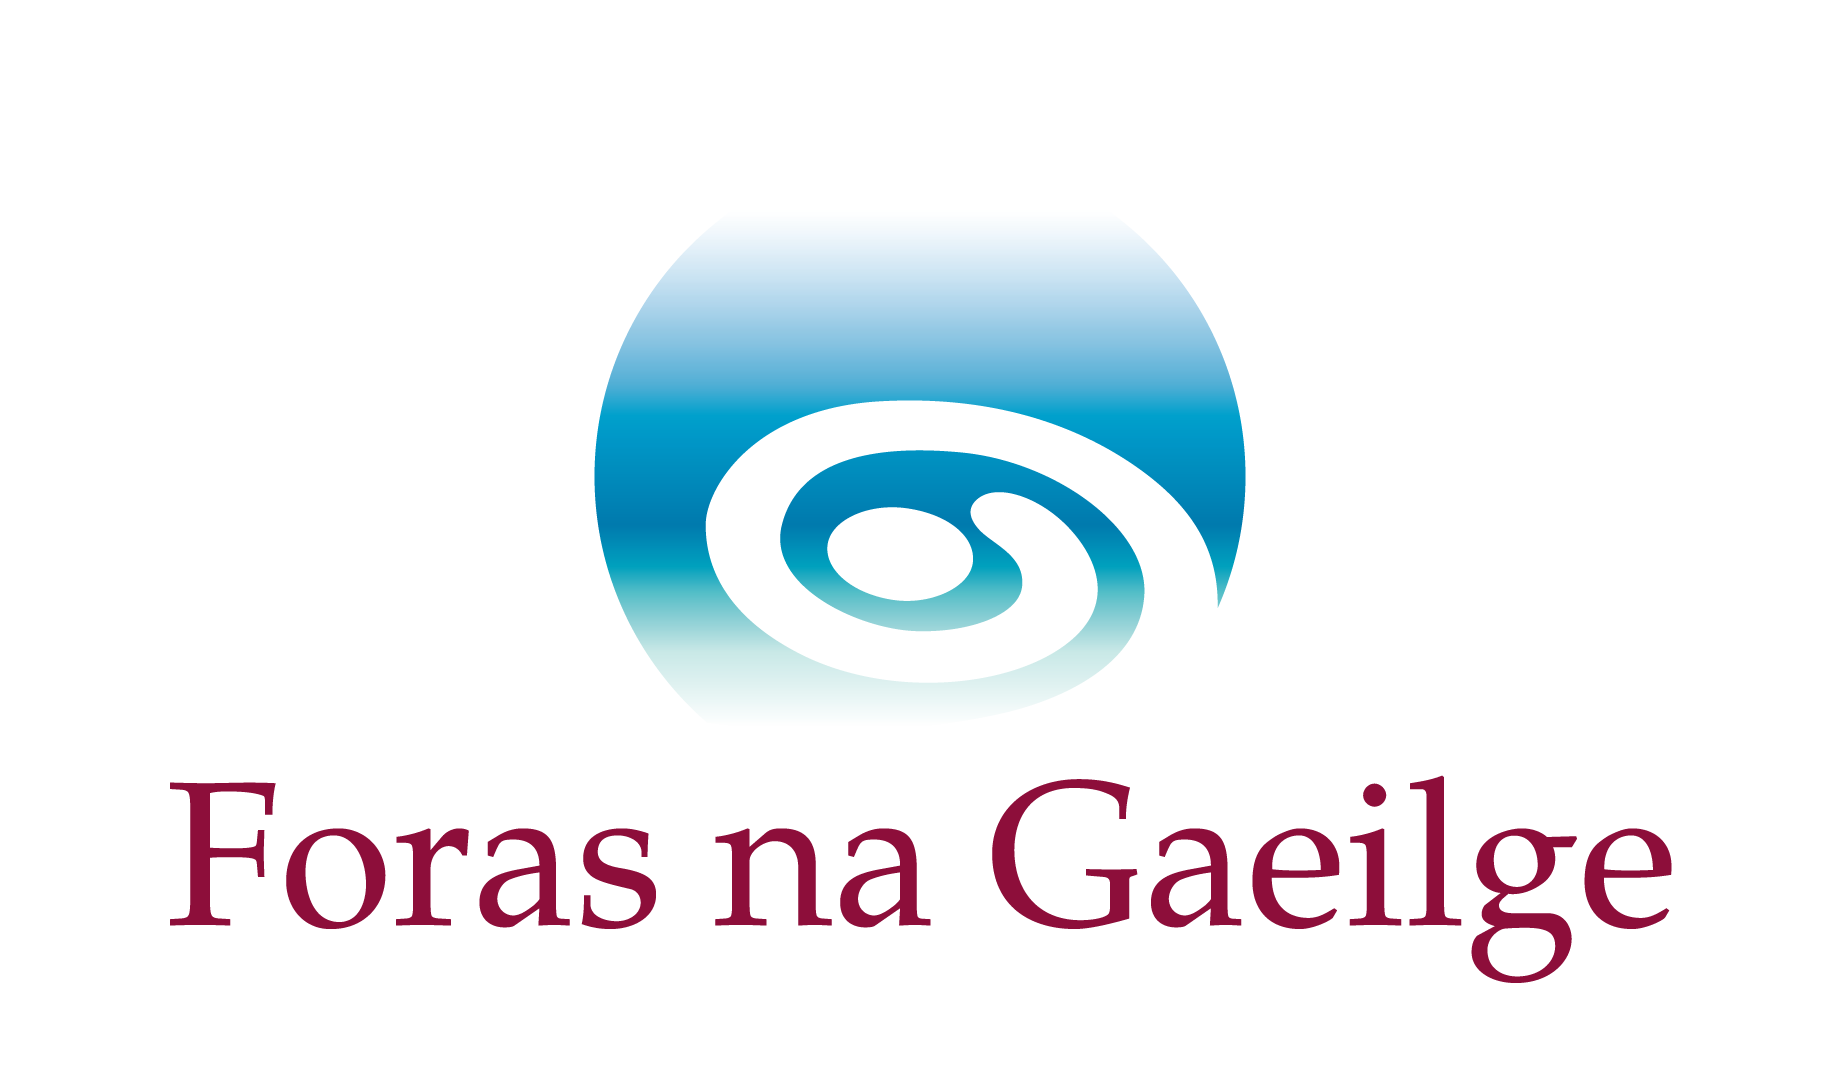 Foras_na_Gaeilge_Logo_2_5_Mor_Bosca_Ban